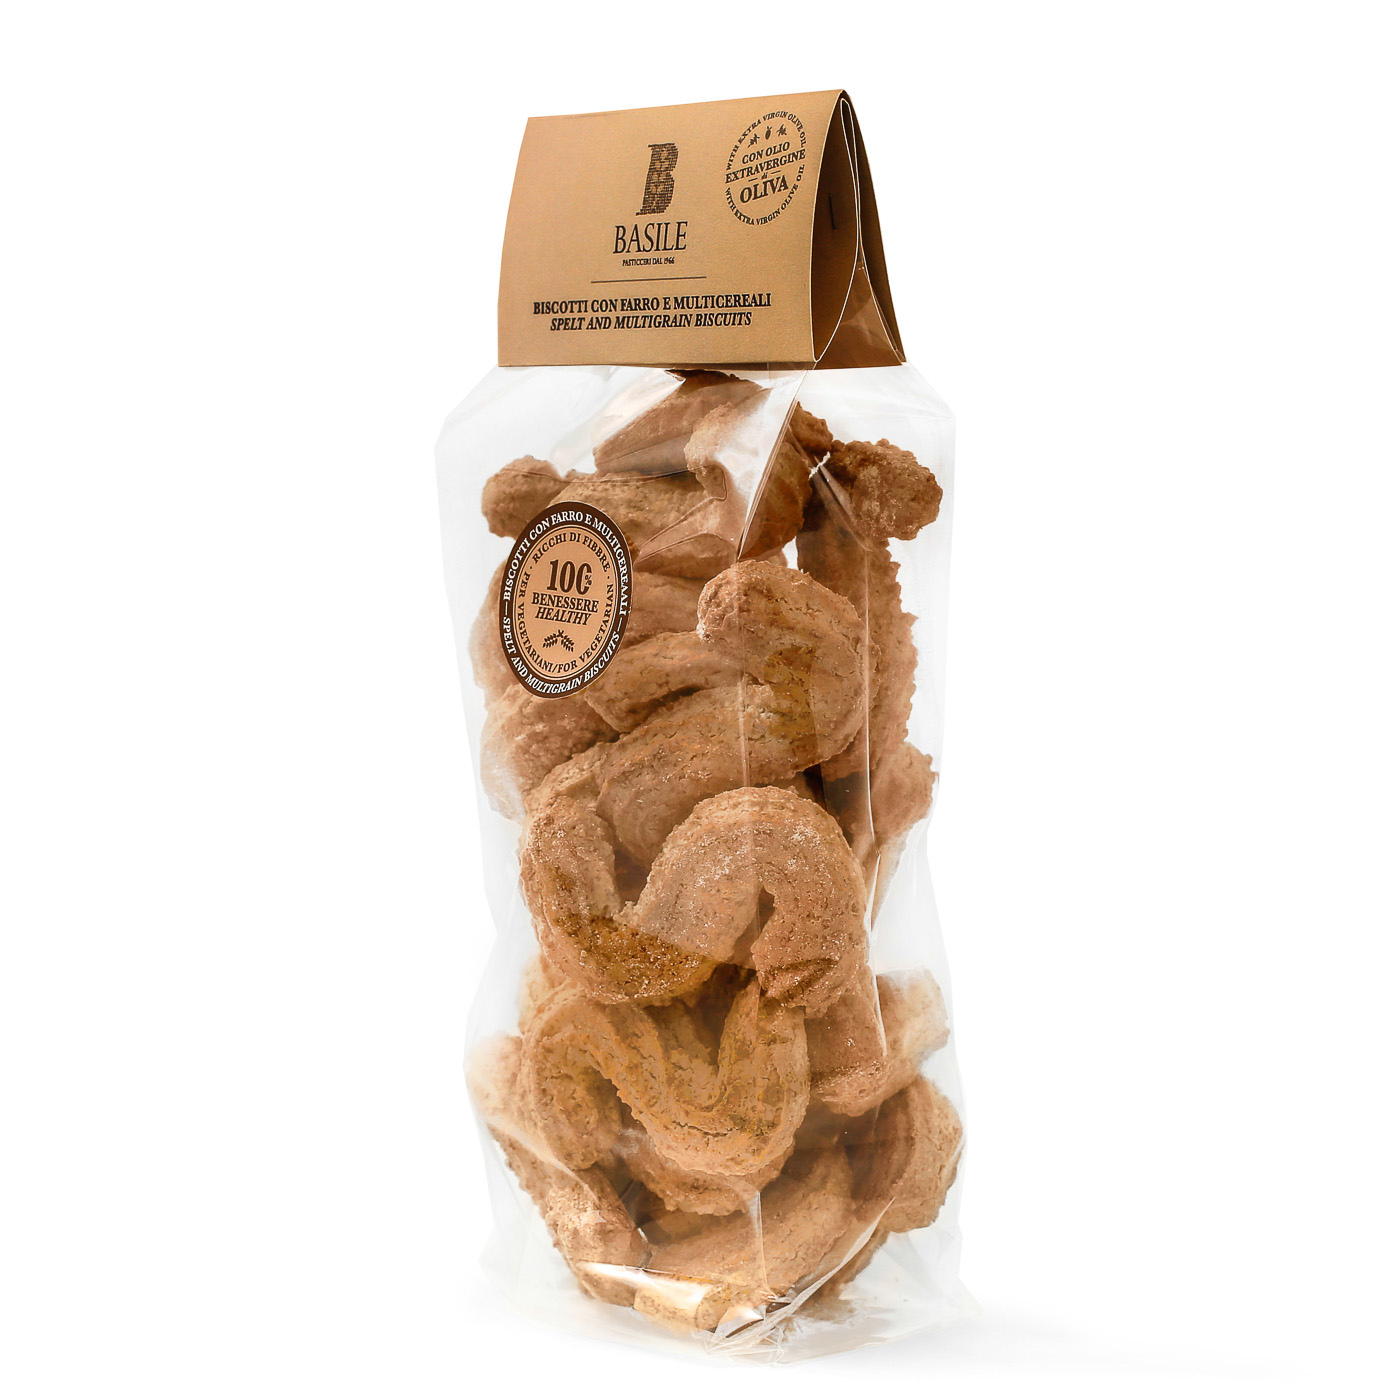 https://www.ragusanews.com//immagini_articoli/14-05-2015/1431626575-1-i-biscotti-integrali-artigianali-di-basile-pasticceri.jpg